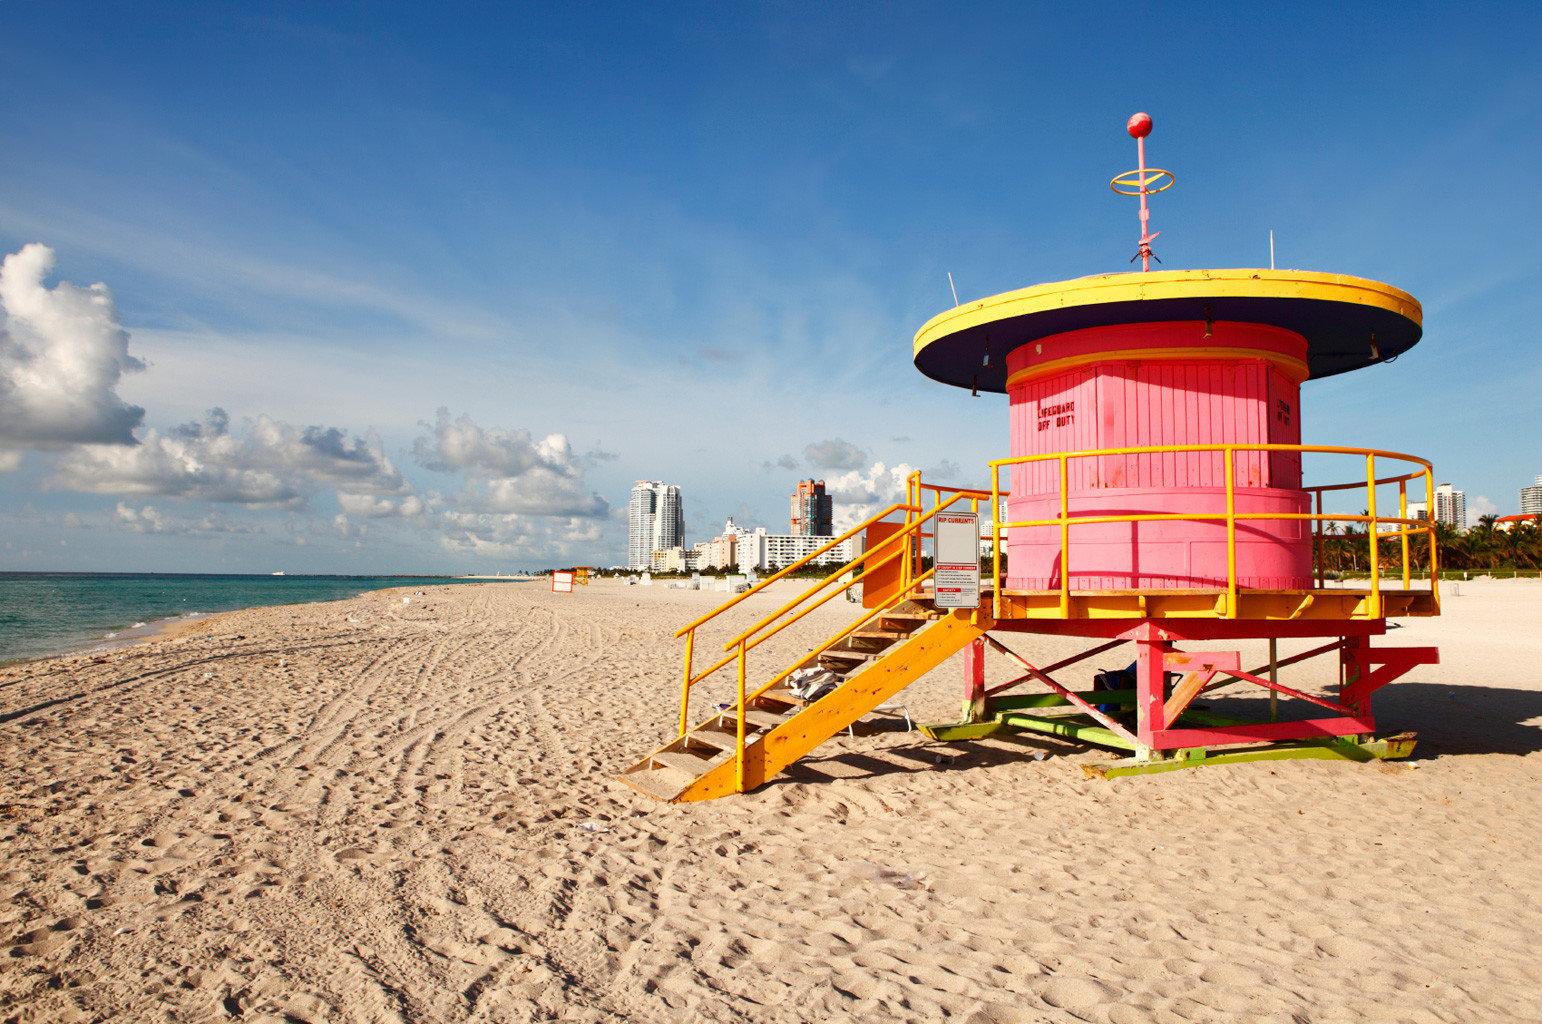 Beach Beachfront Ocean sky ground Sea Coast sand shore vehicle yellow tower